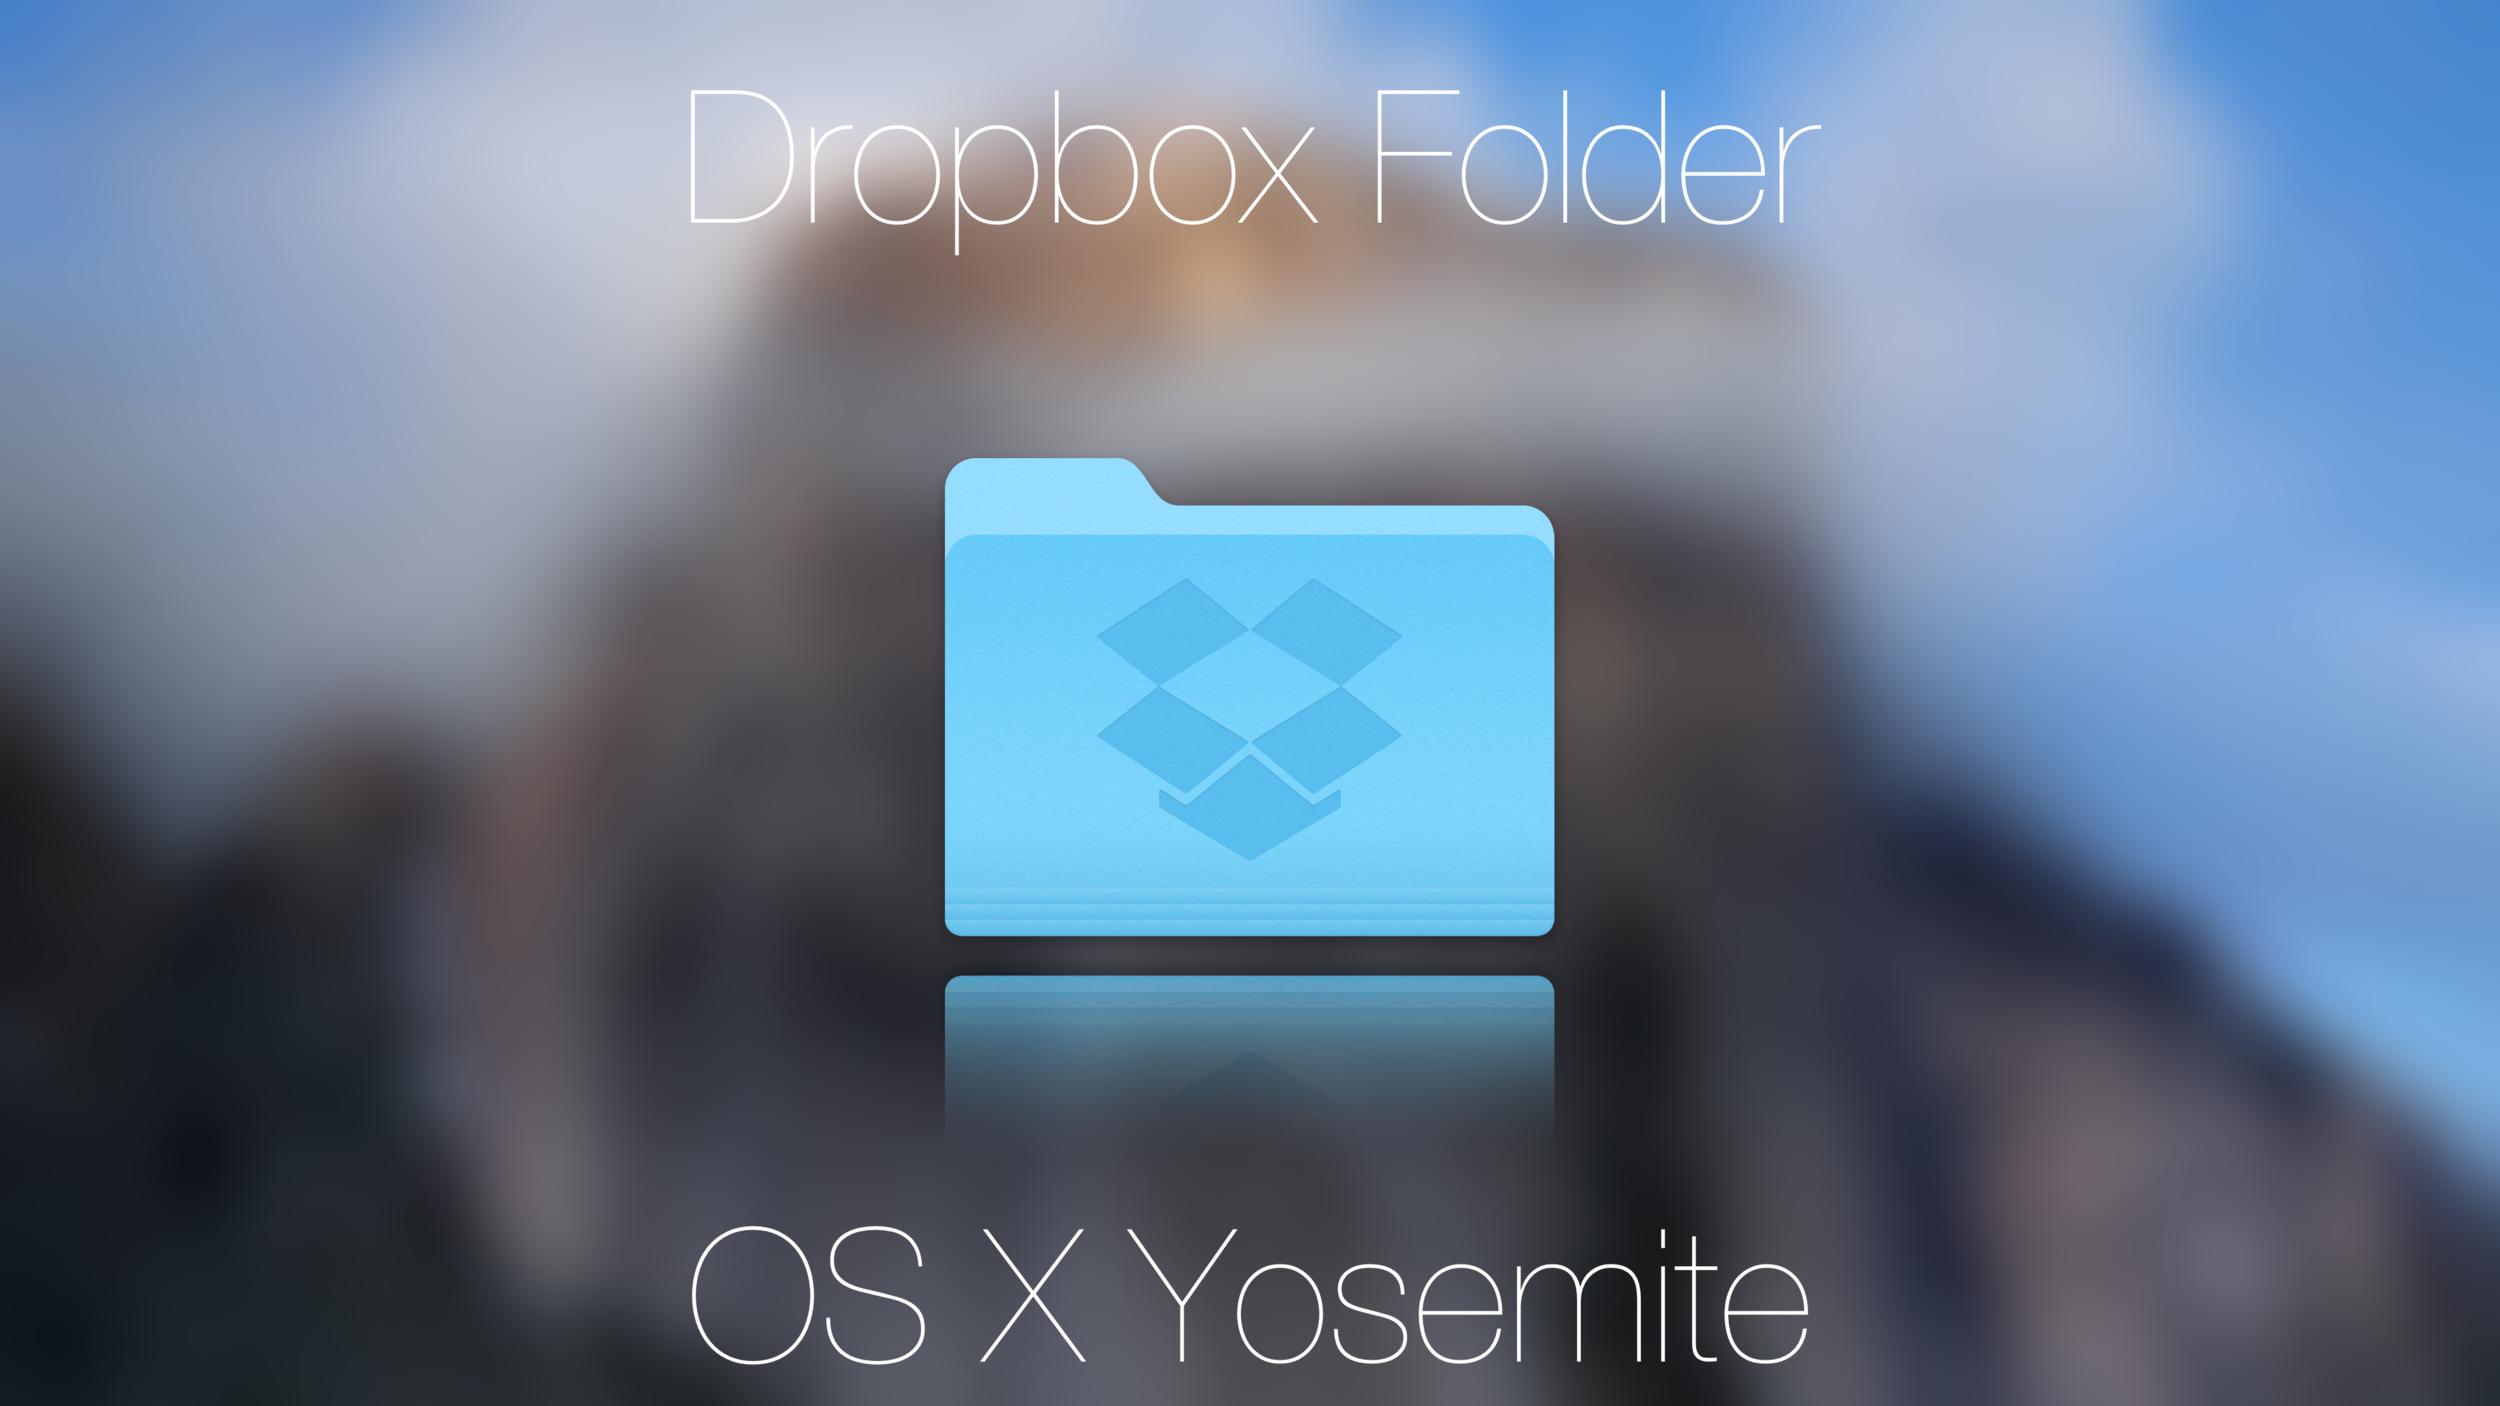 dropbox_folder_for_os_x_yosemite_by_coloradan-d7tv5zh.png